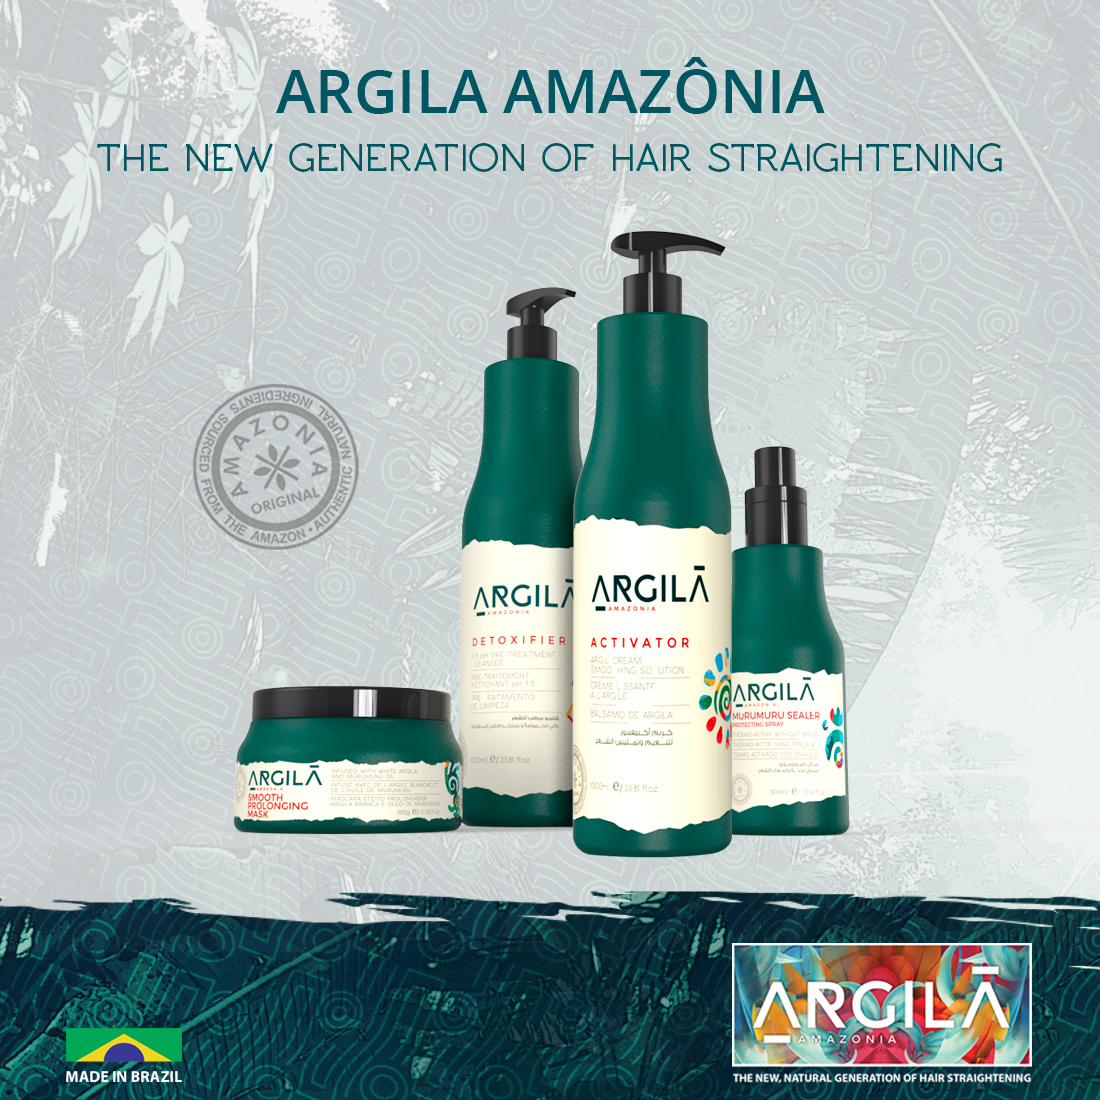 Media Kit Argila Amazônia 9.jpg